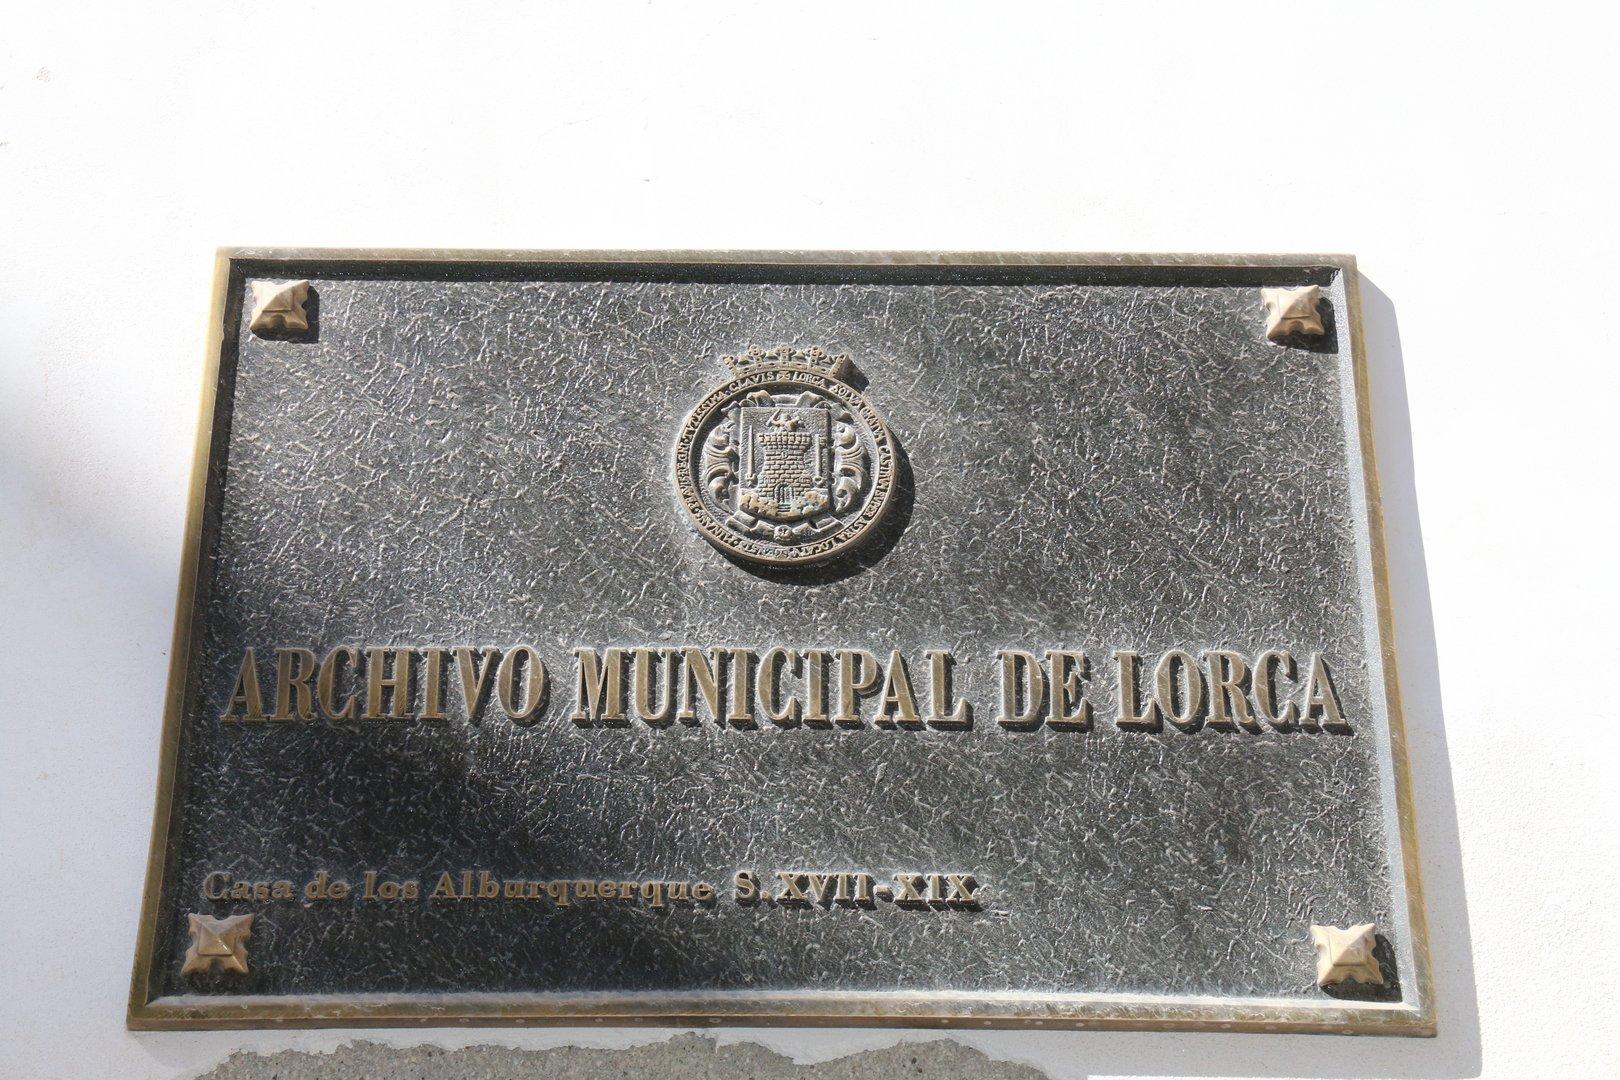 Archivo municipal de Lorca (Casa de los Alburquerque)